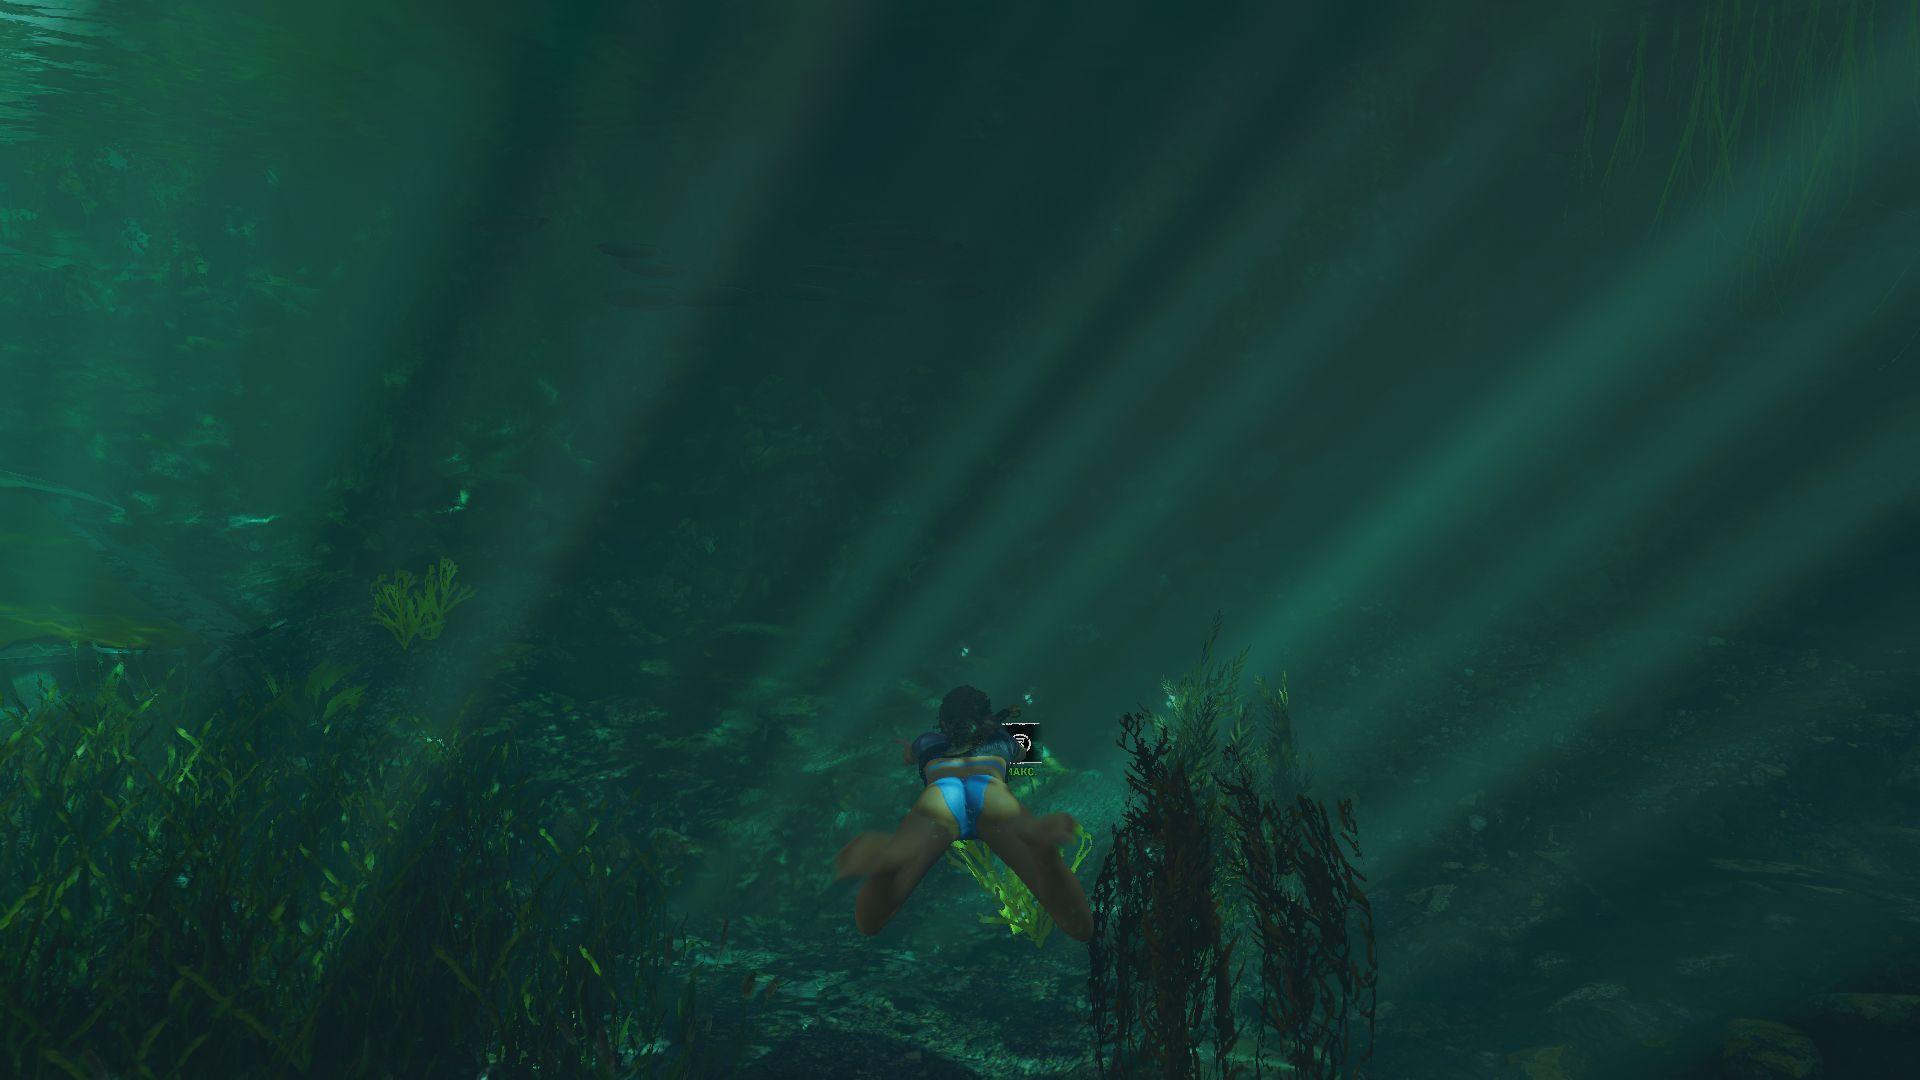 000678.Jpg - Shadow of the Tomb Raider